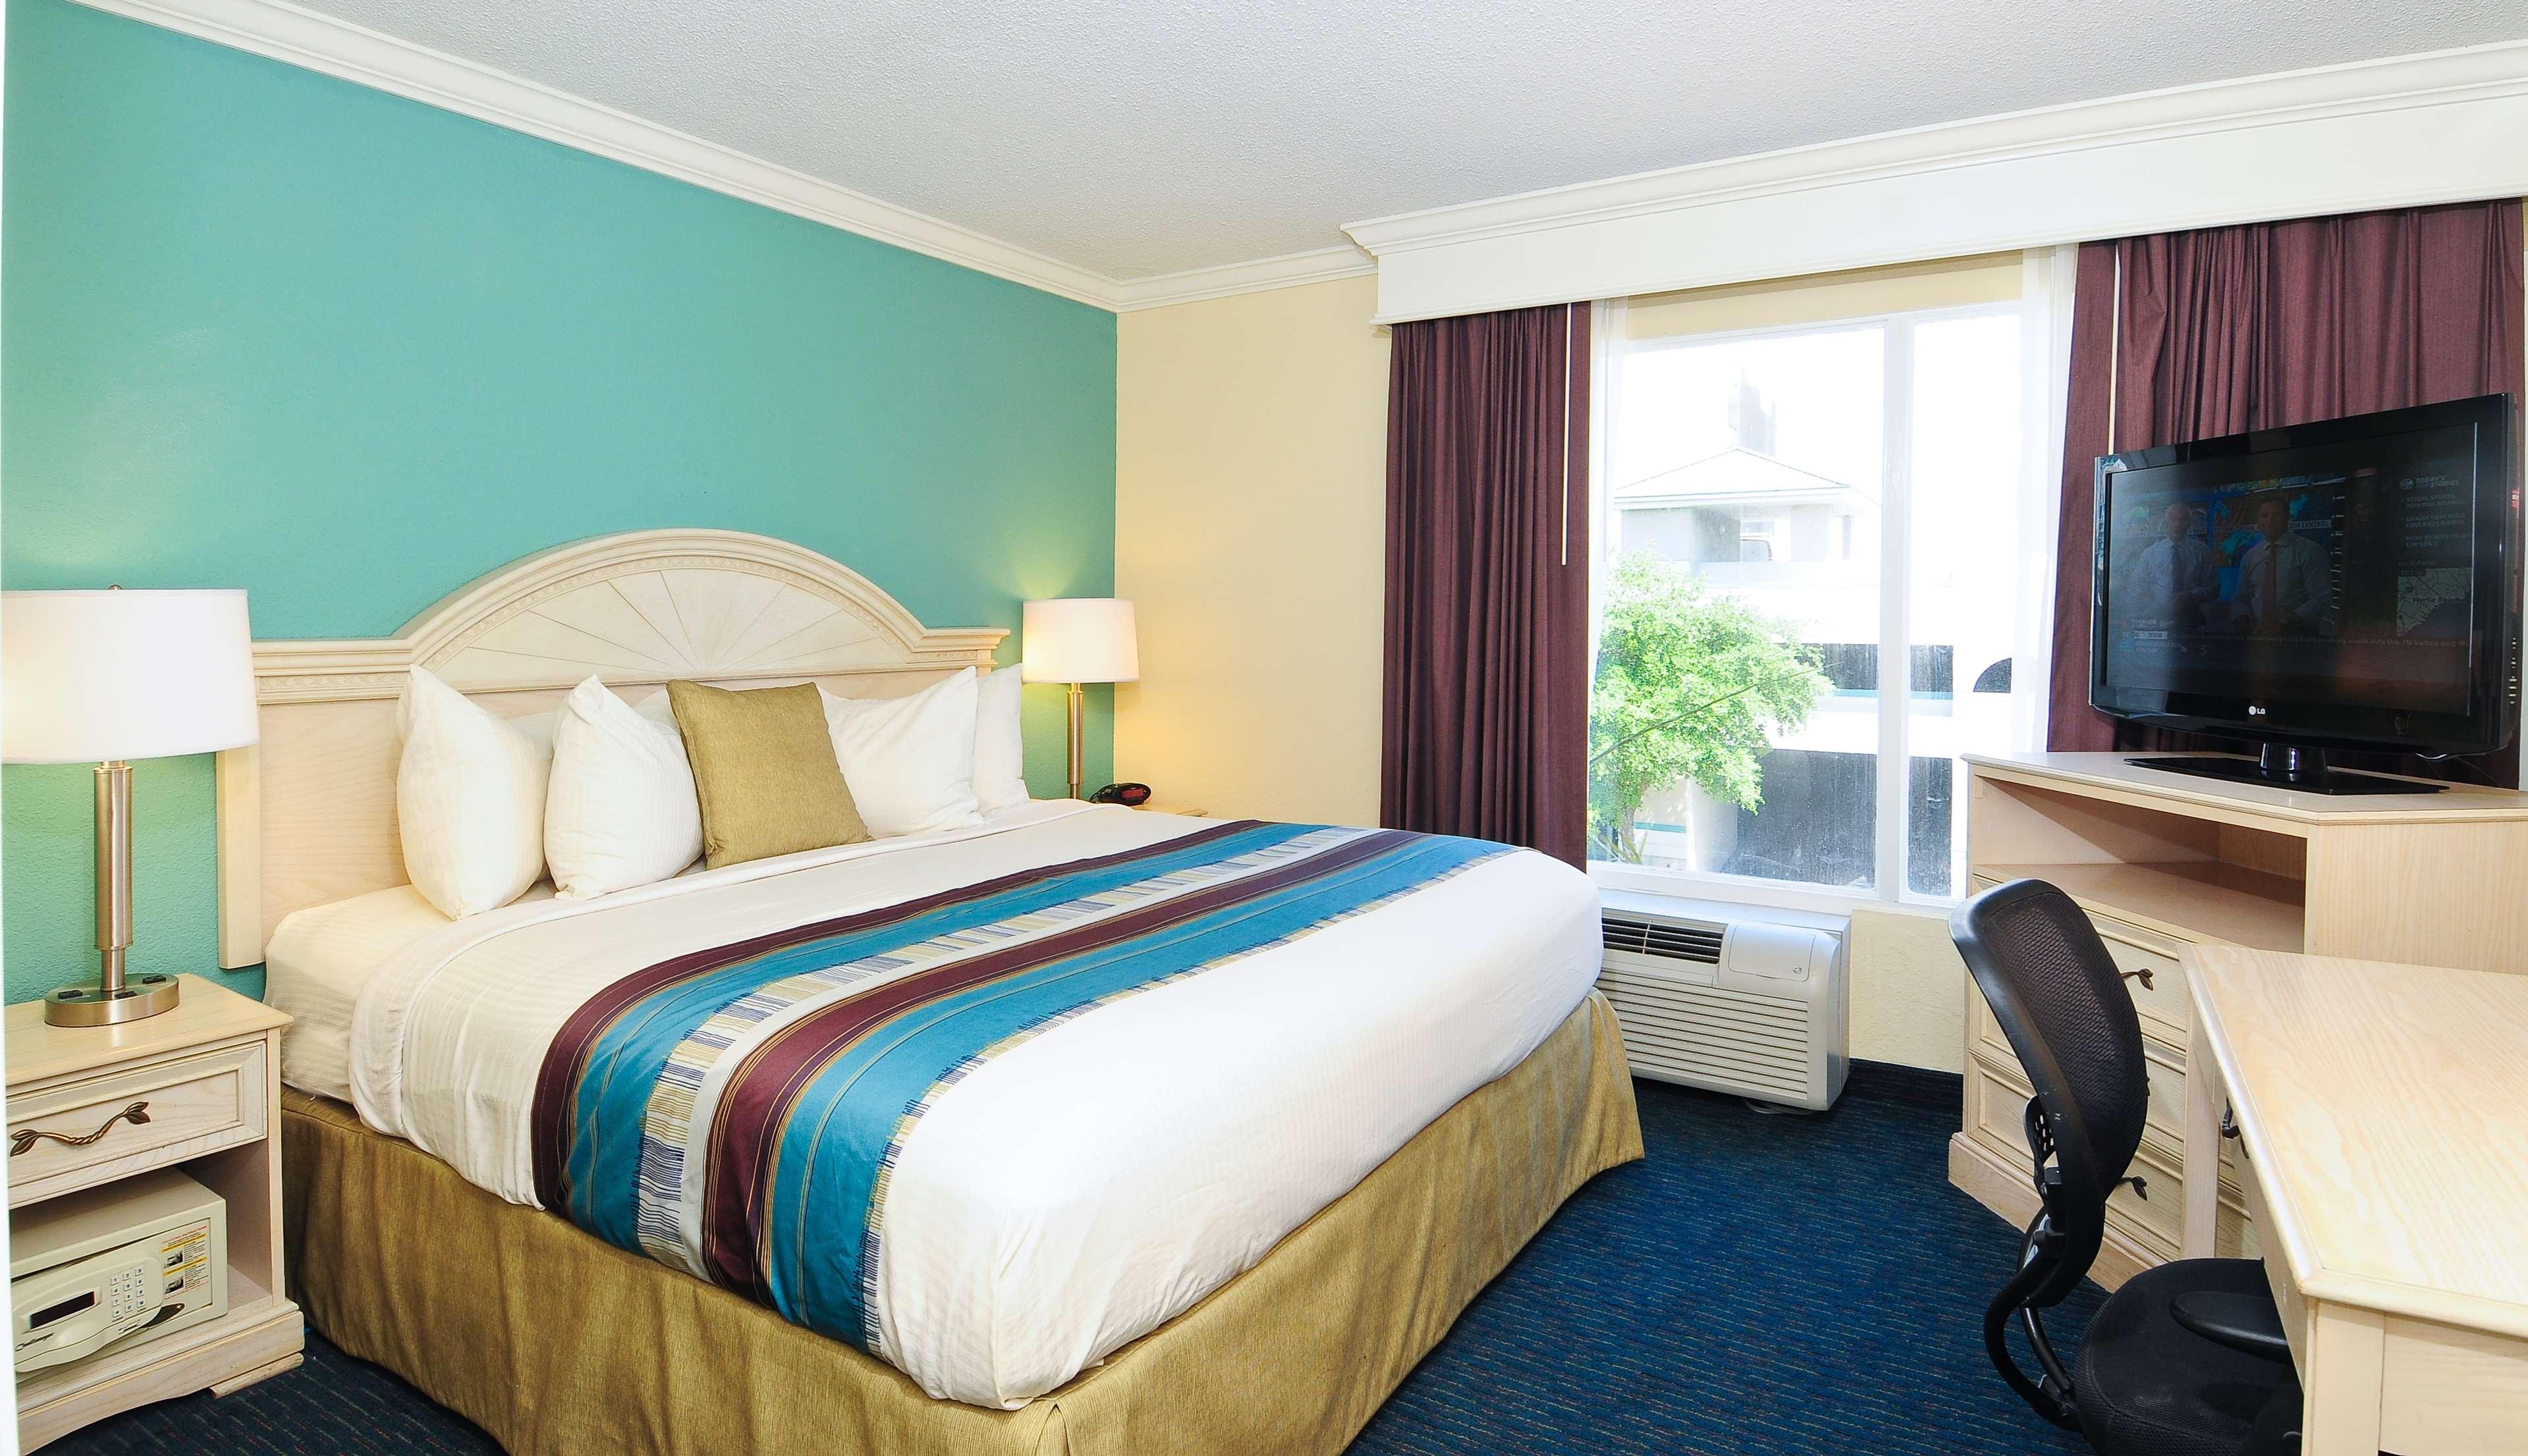 Best Western Plus Grand Strand Inn & Suites image 13